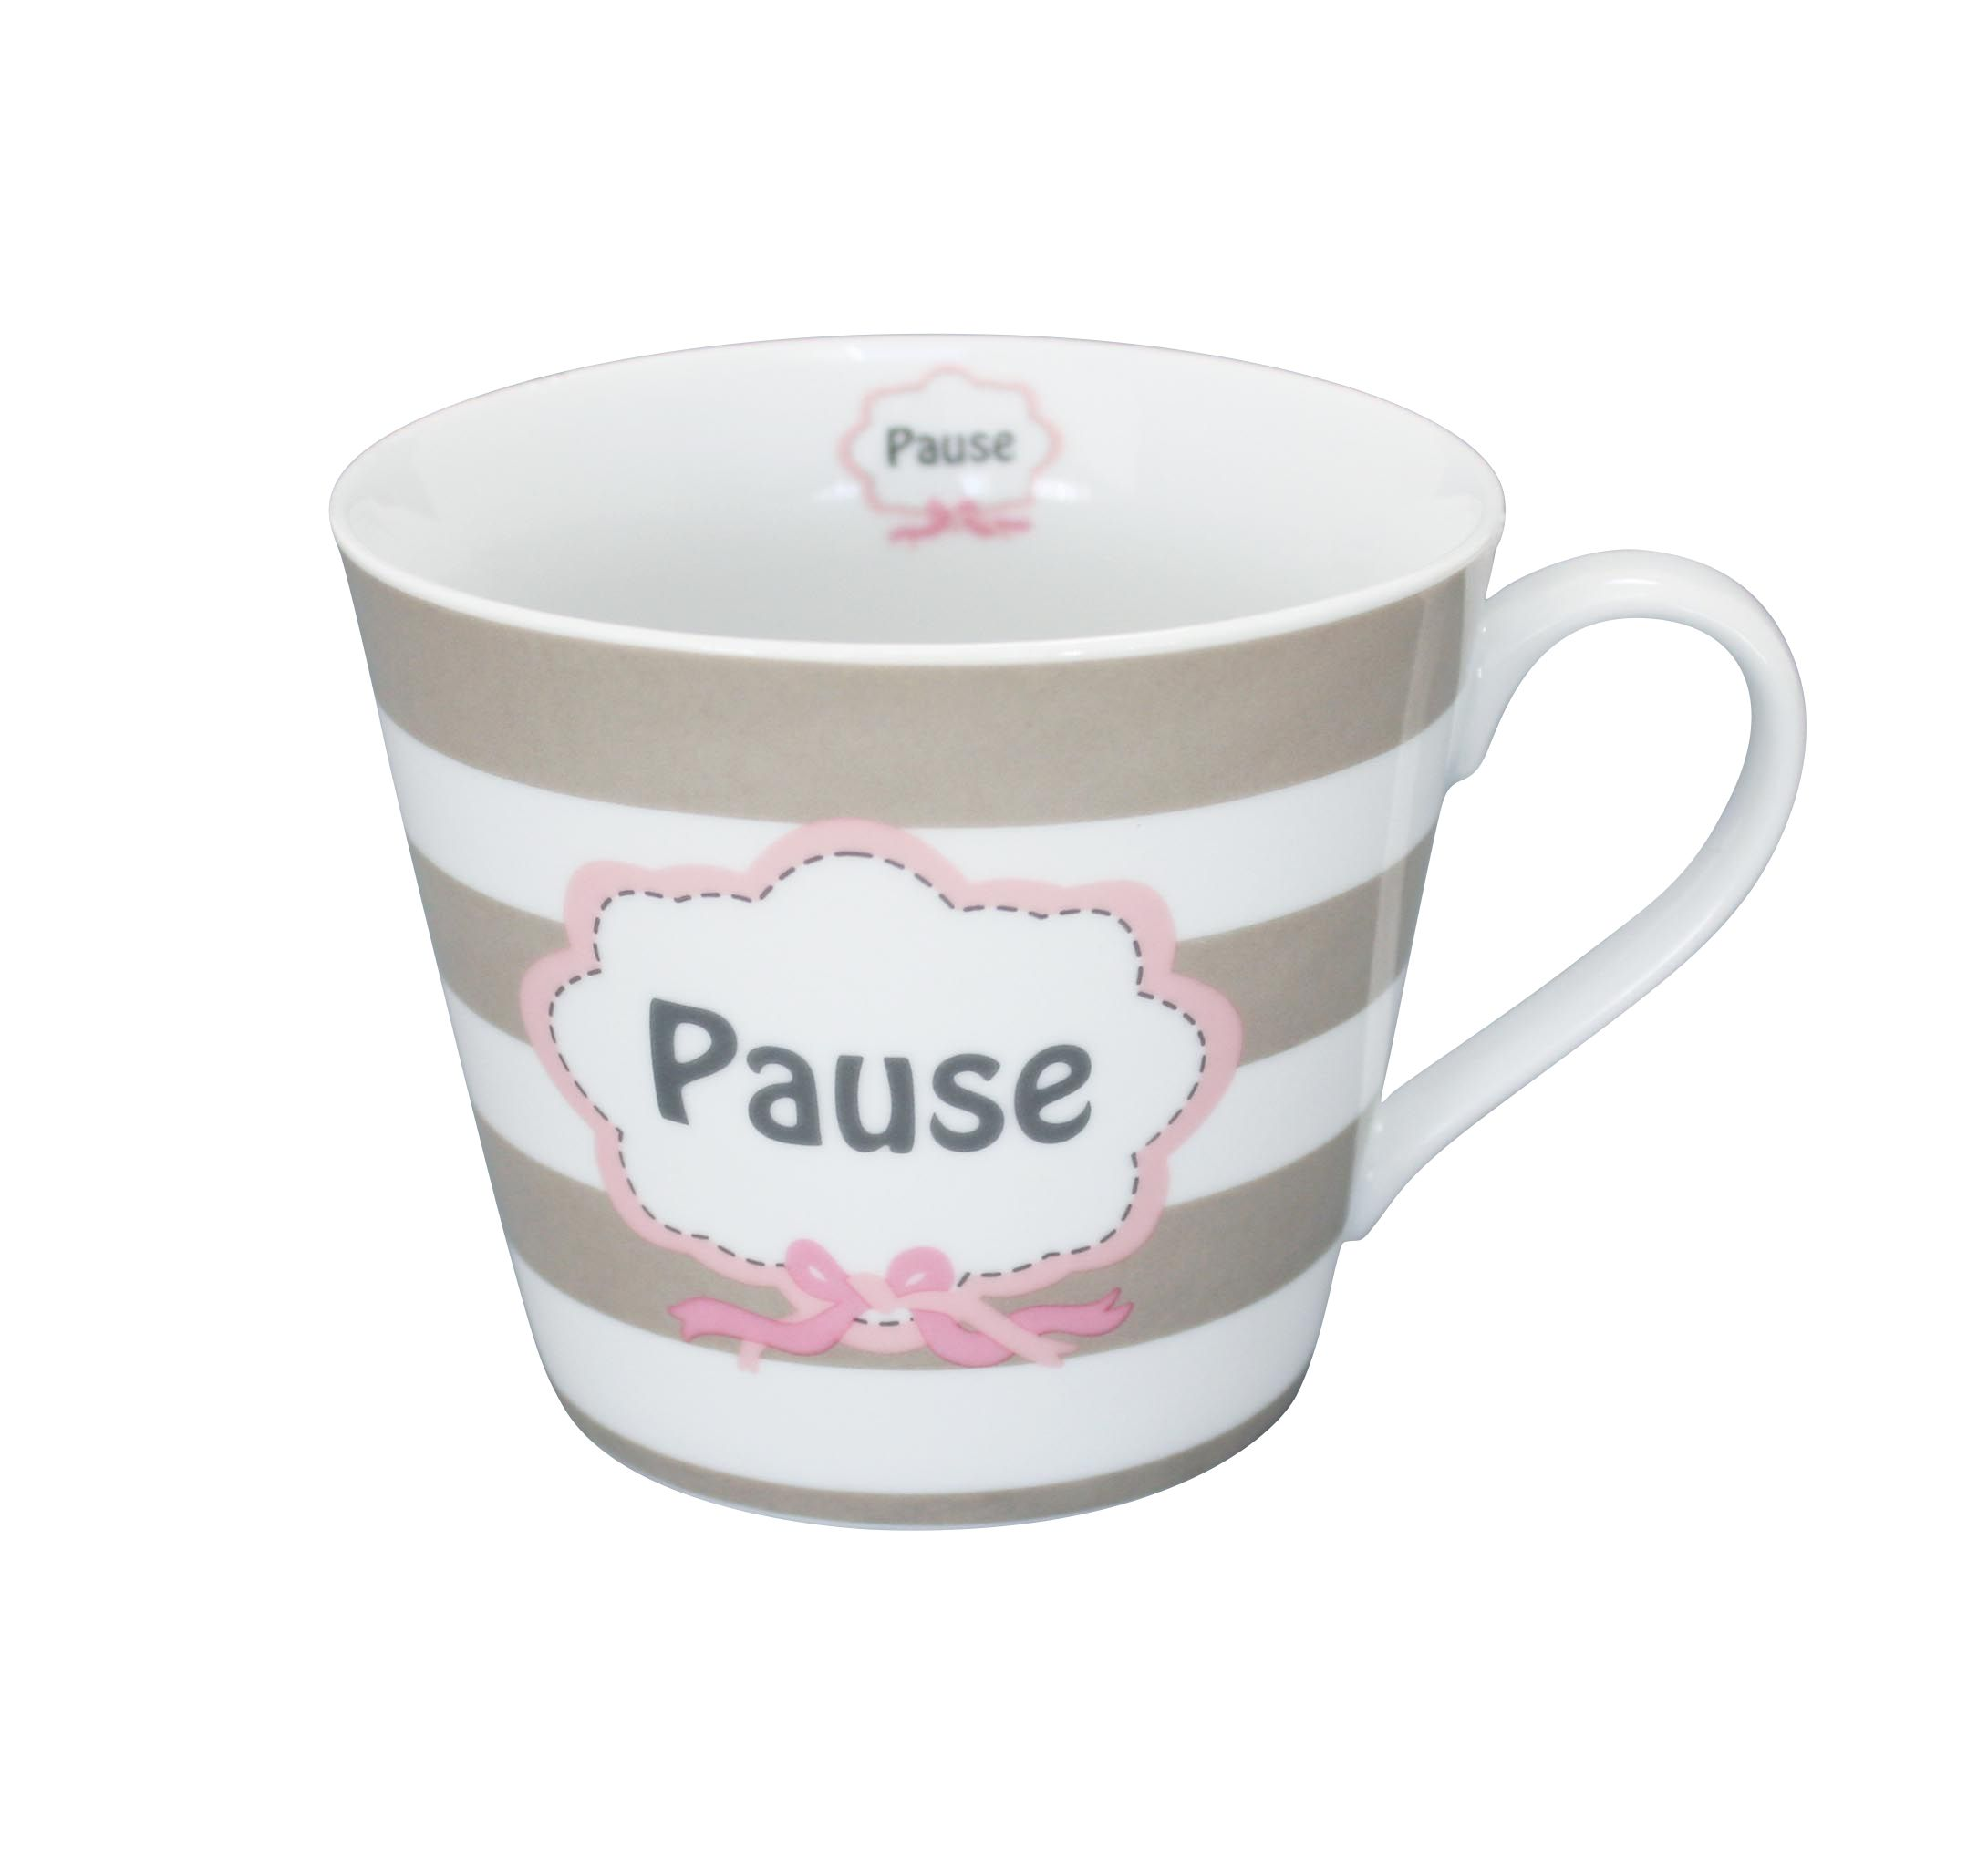 Krasilnikoff Happy Cup Tasse, Pause Material Porzellan